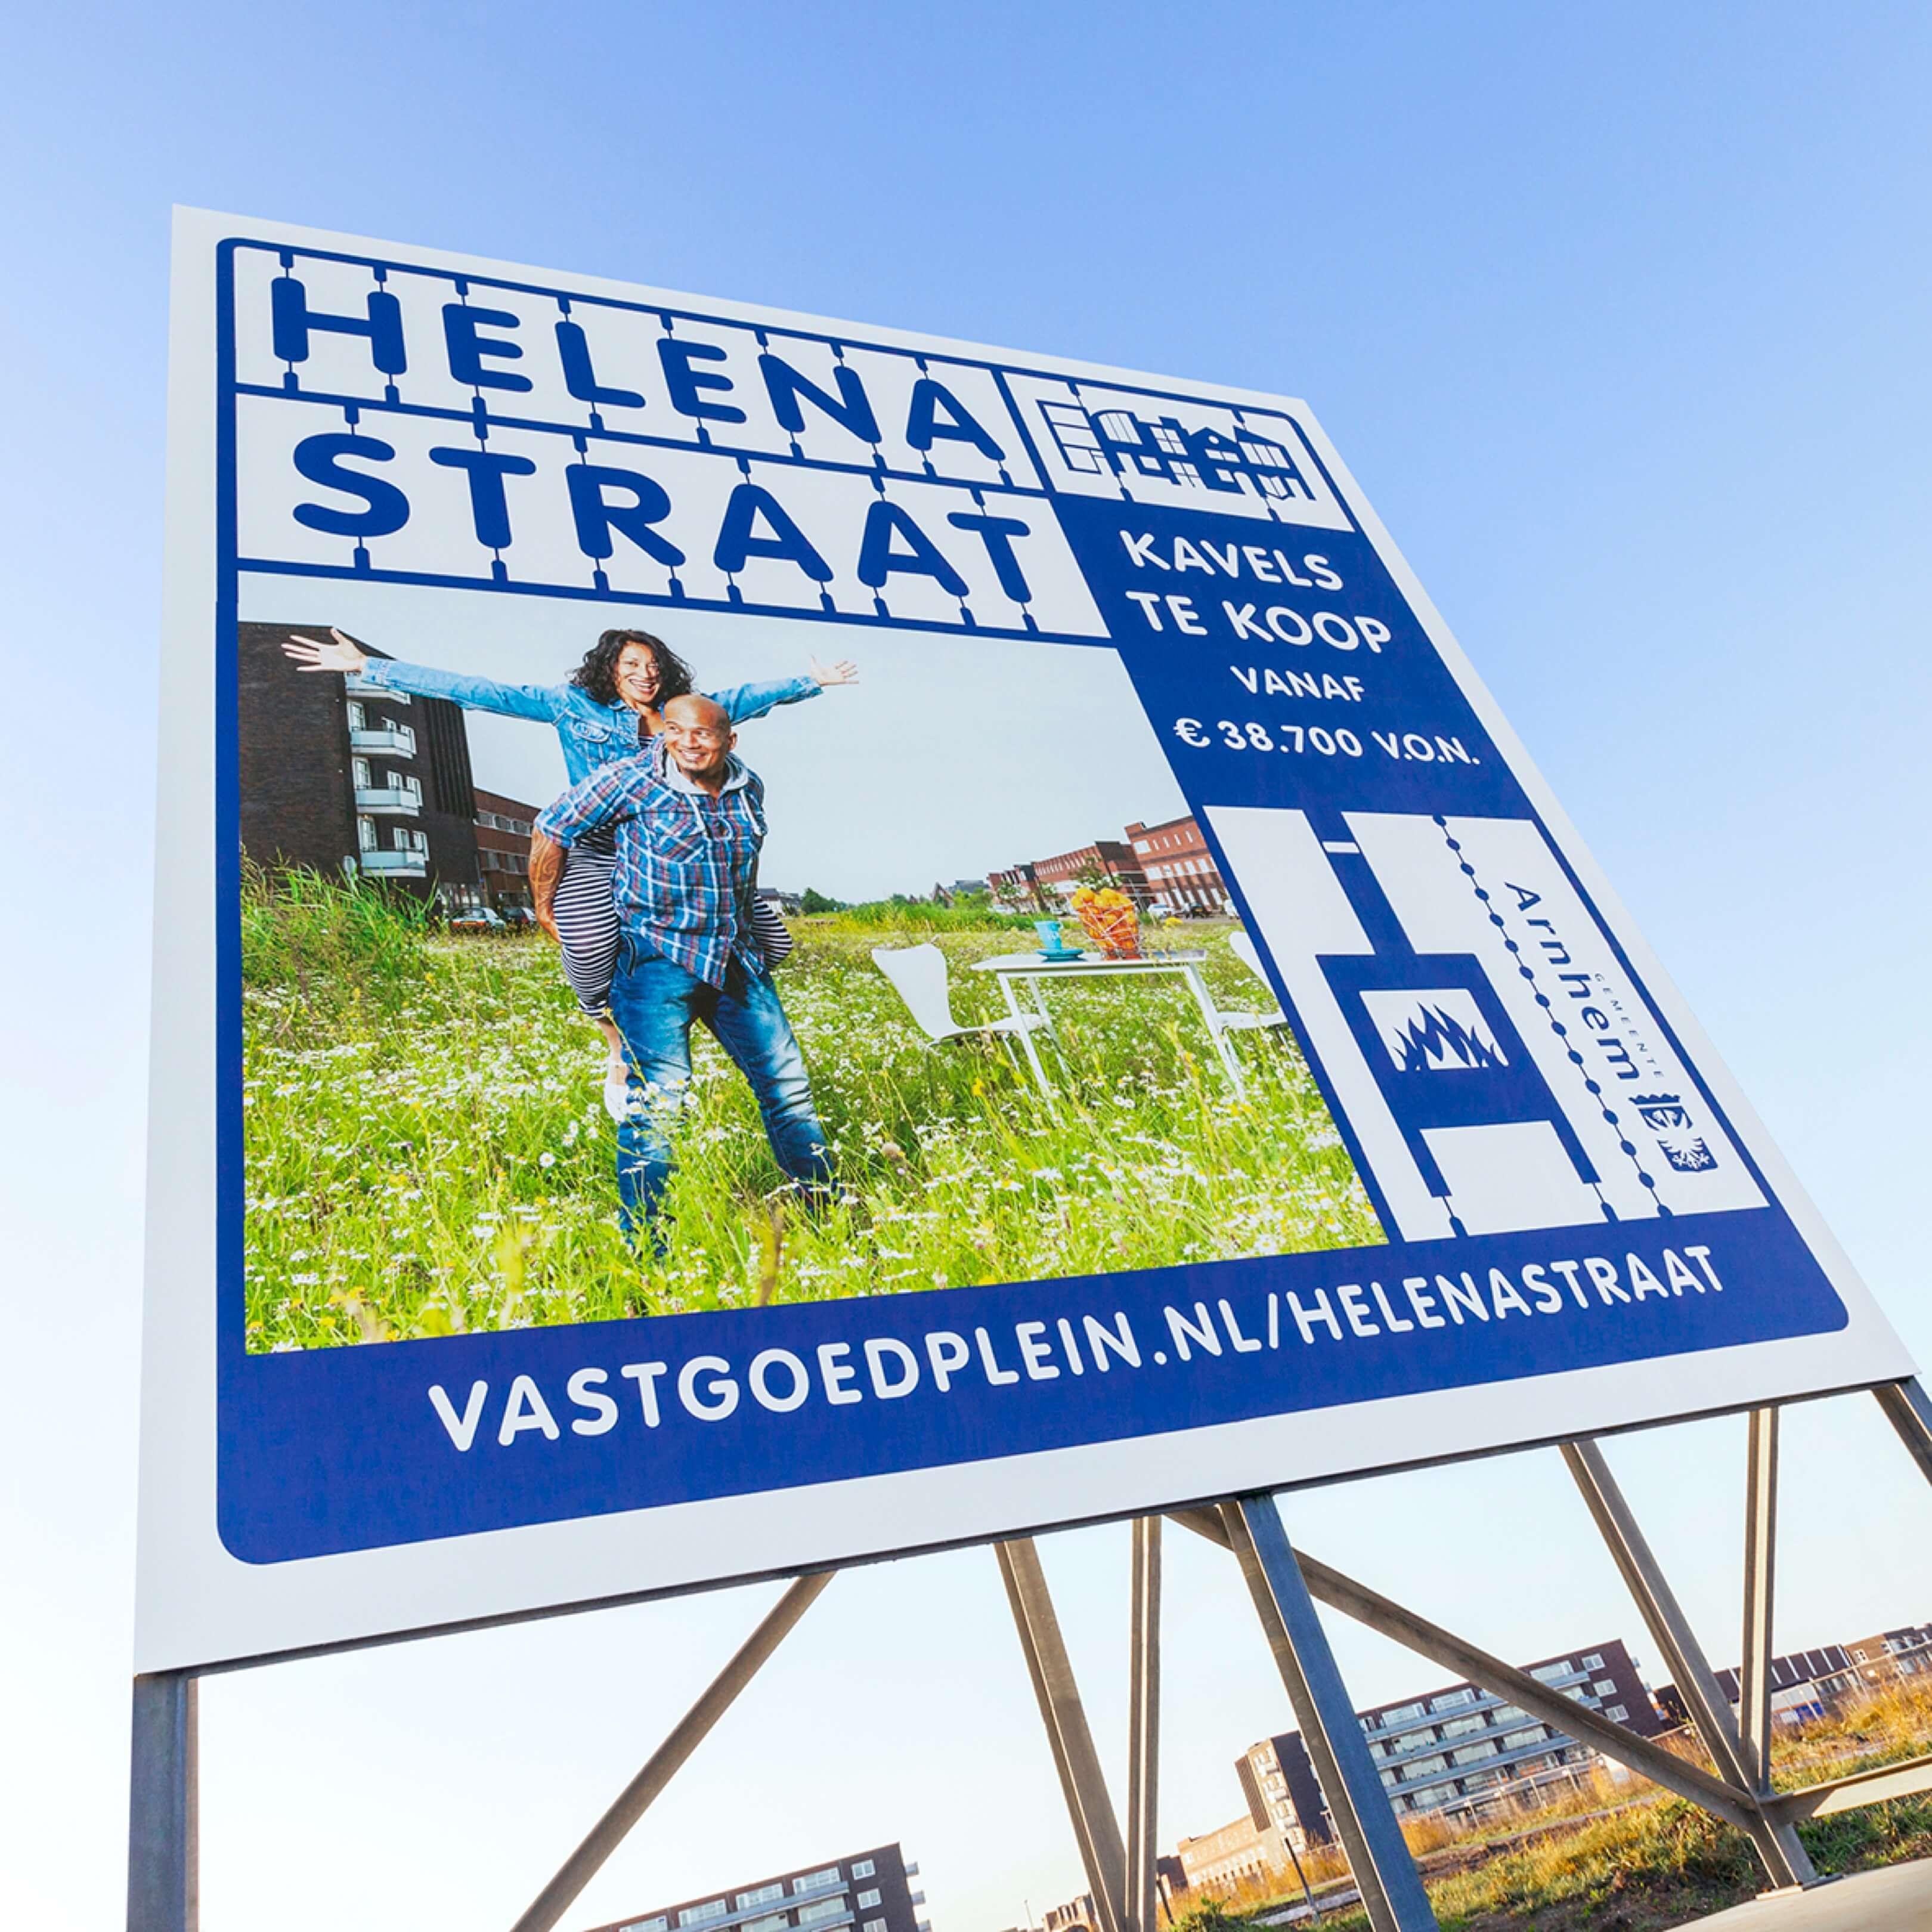 Jurjen Poeles Fotografie Gemeente Arnhem Vastgoedplein Schuytgraaf Helena straat campagne lifestyle wonen vastgoed vastgoedfotografie